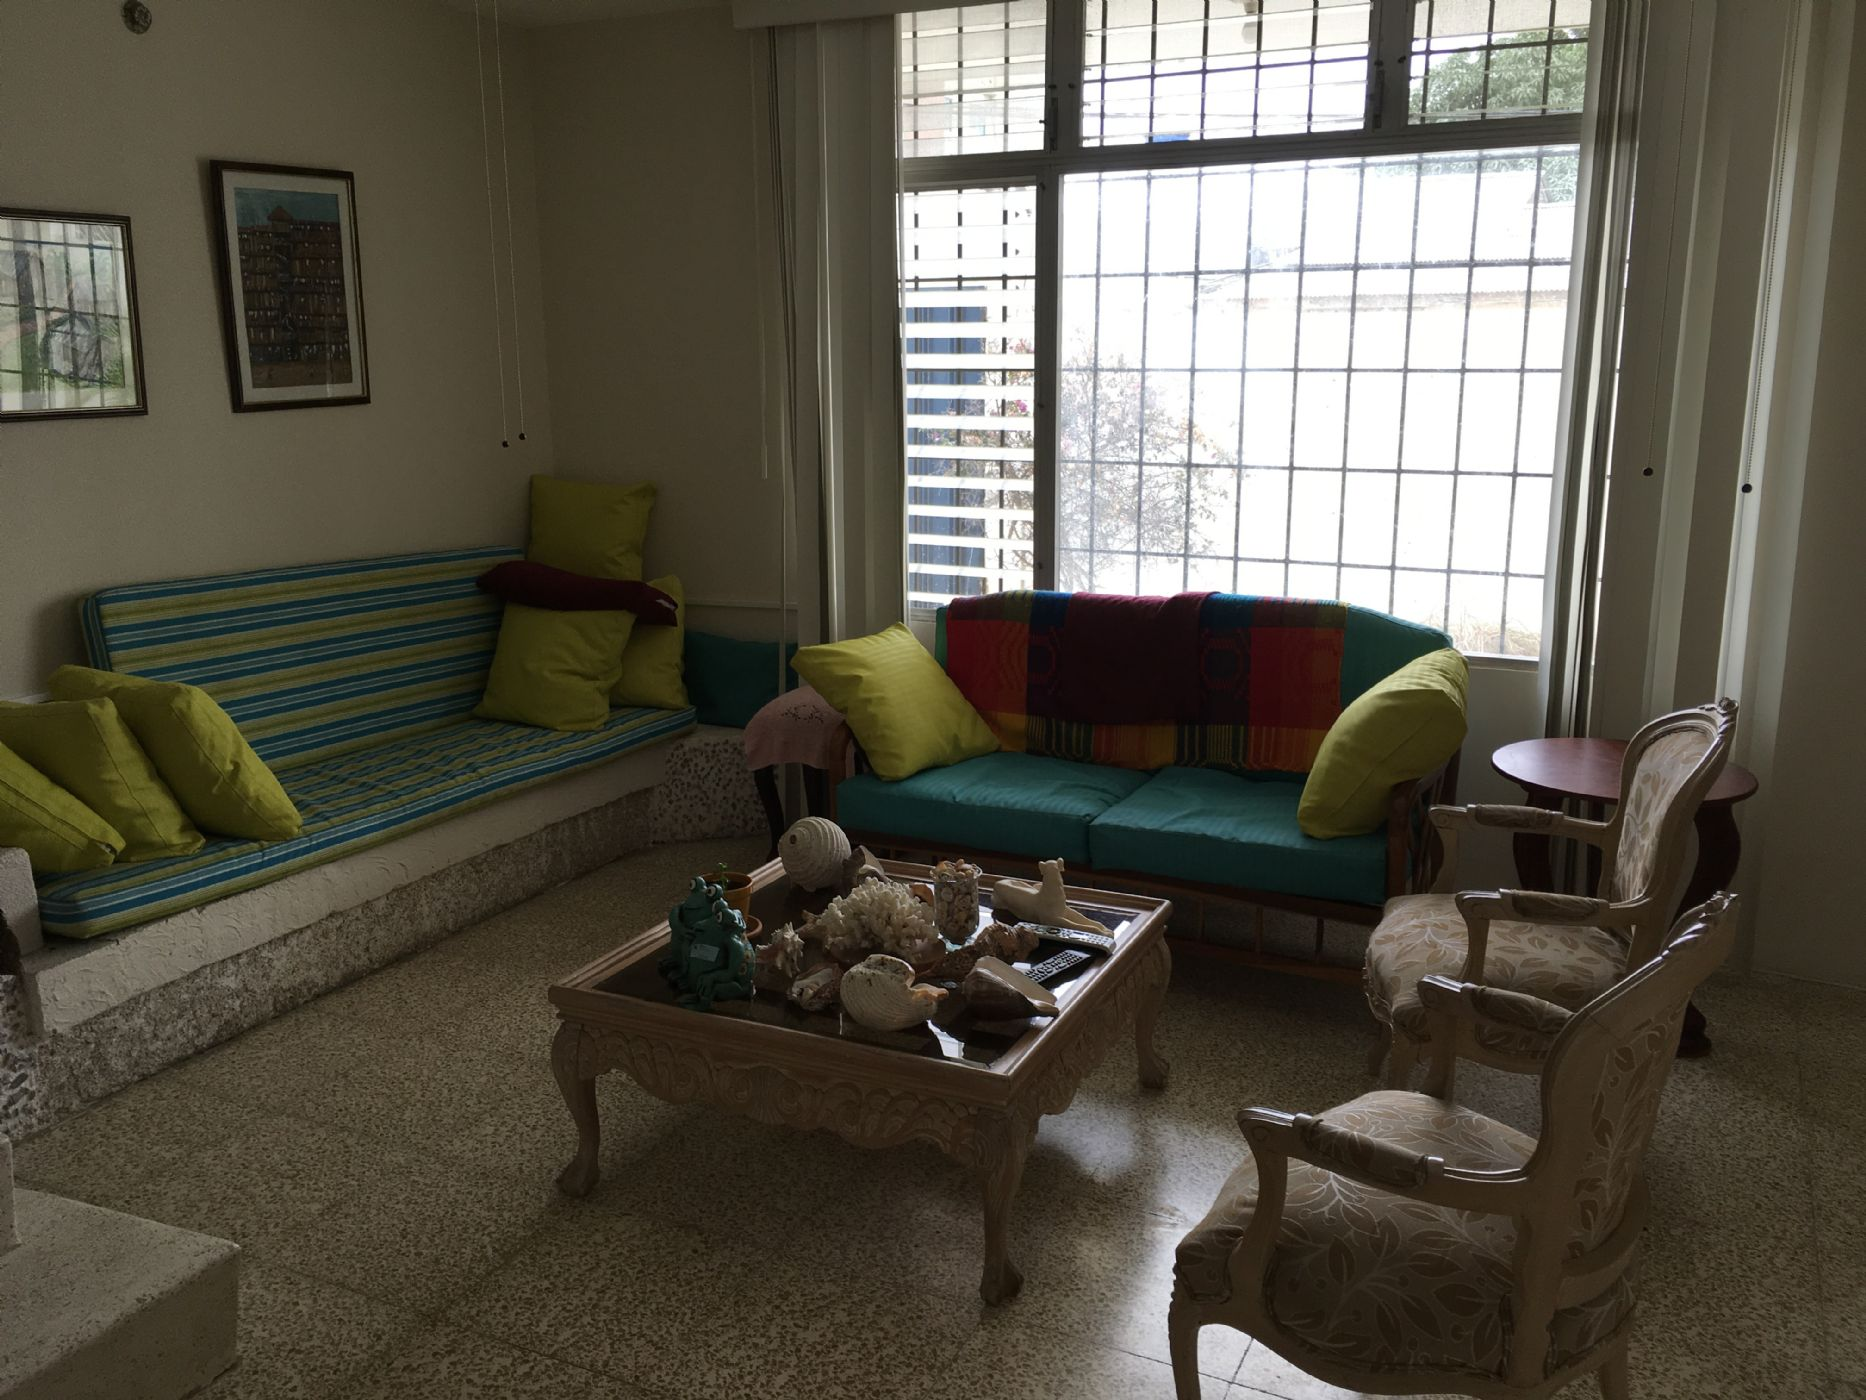 Salinas-Ecuador-property-513709-7.JPG